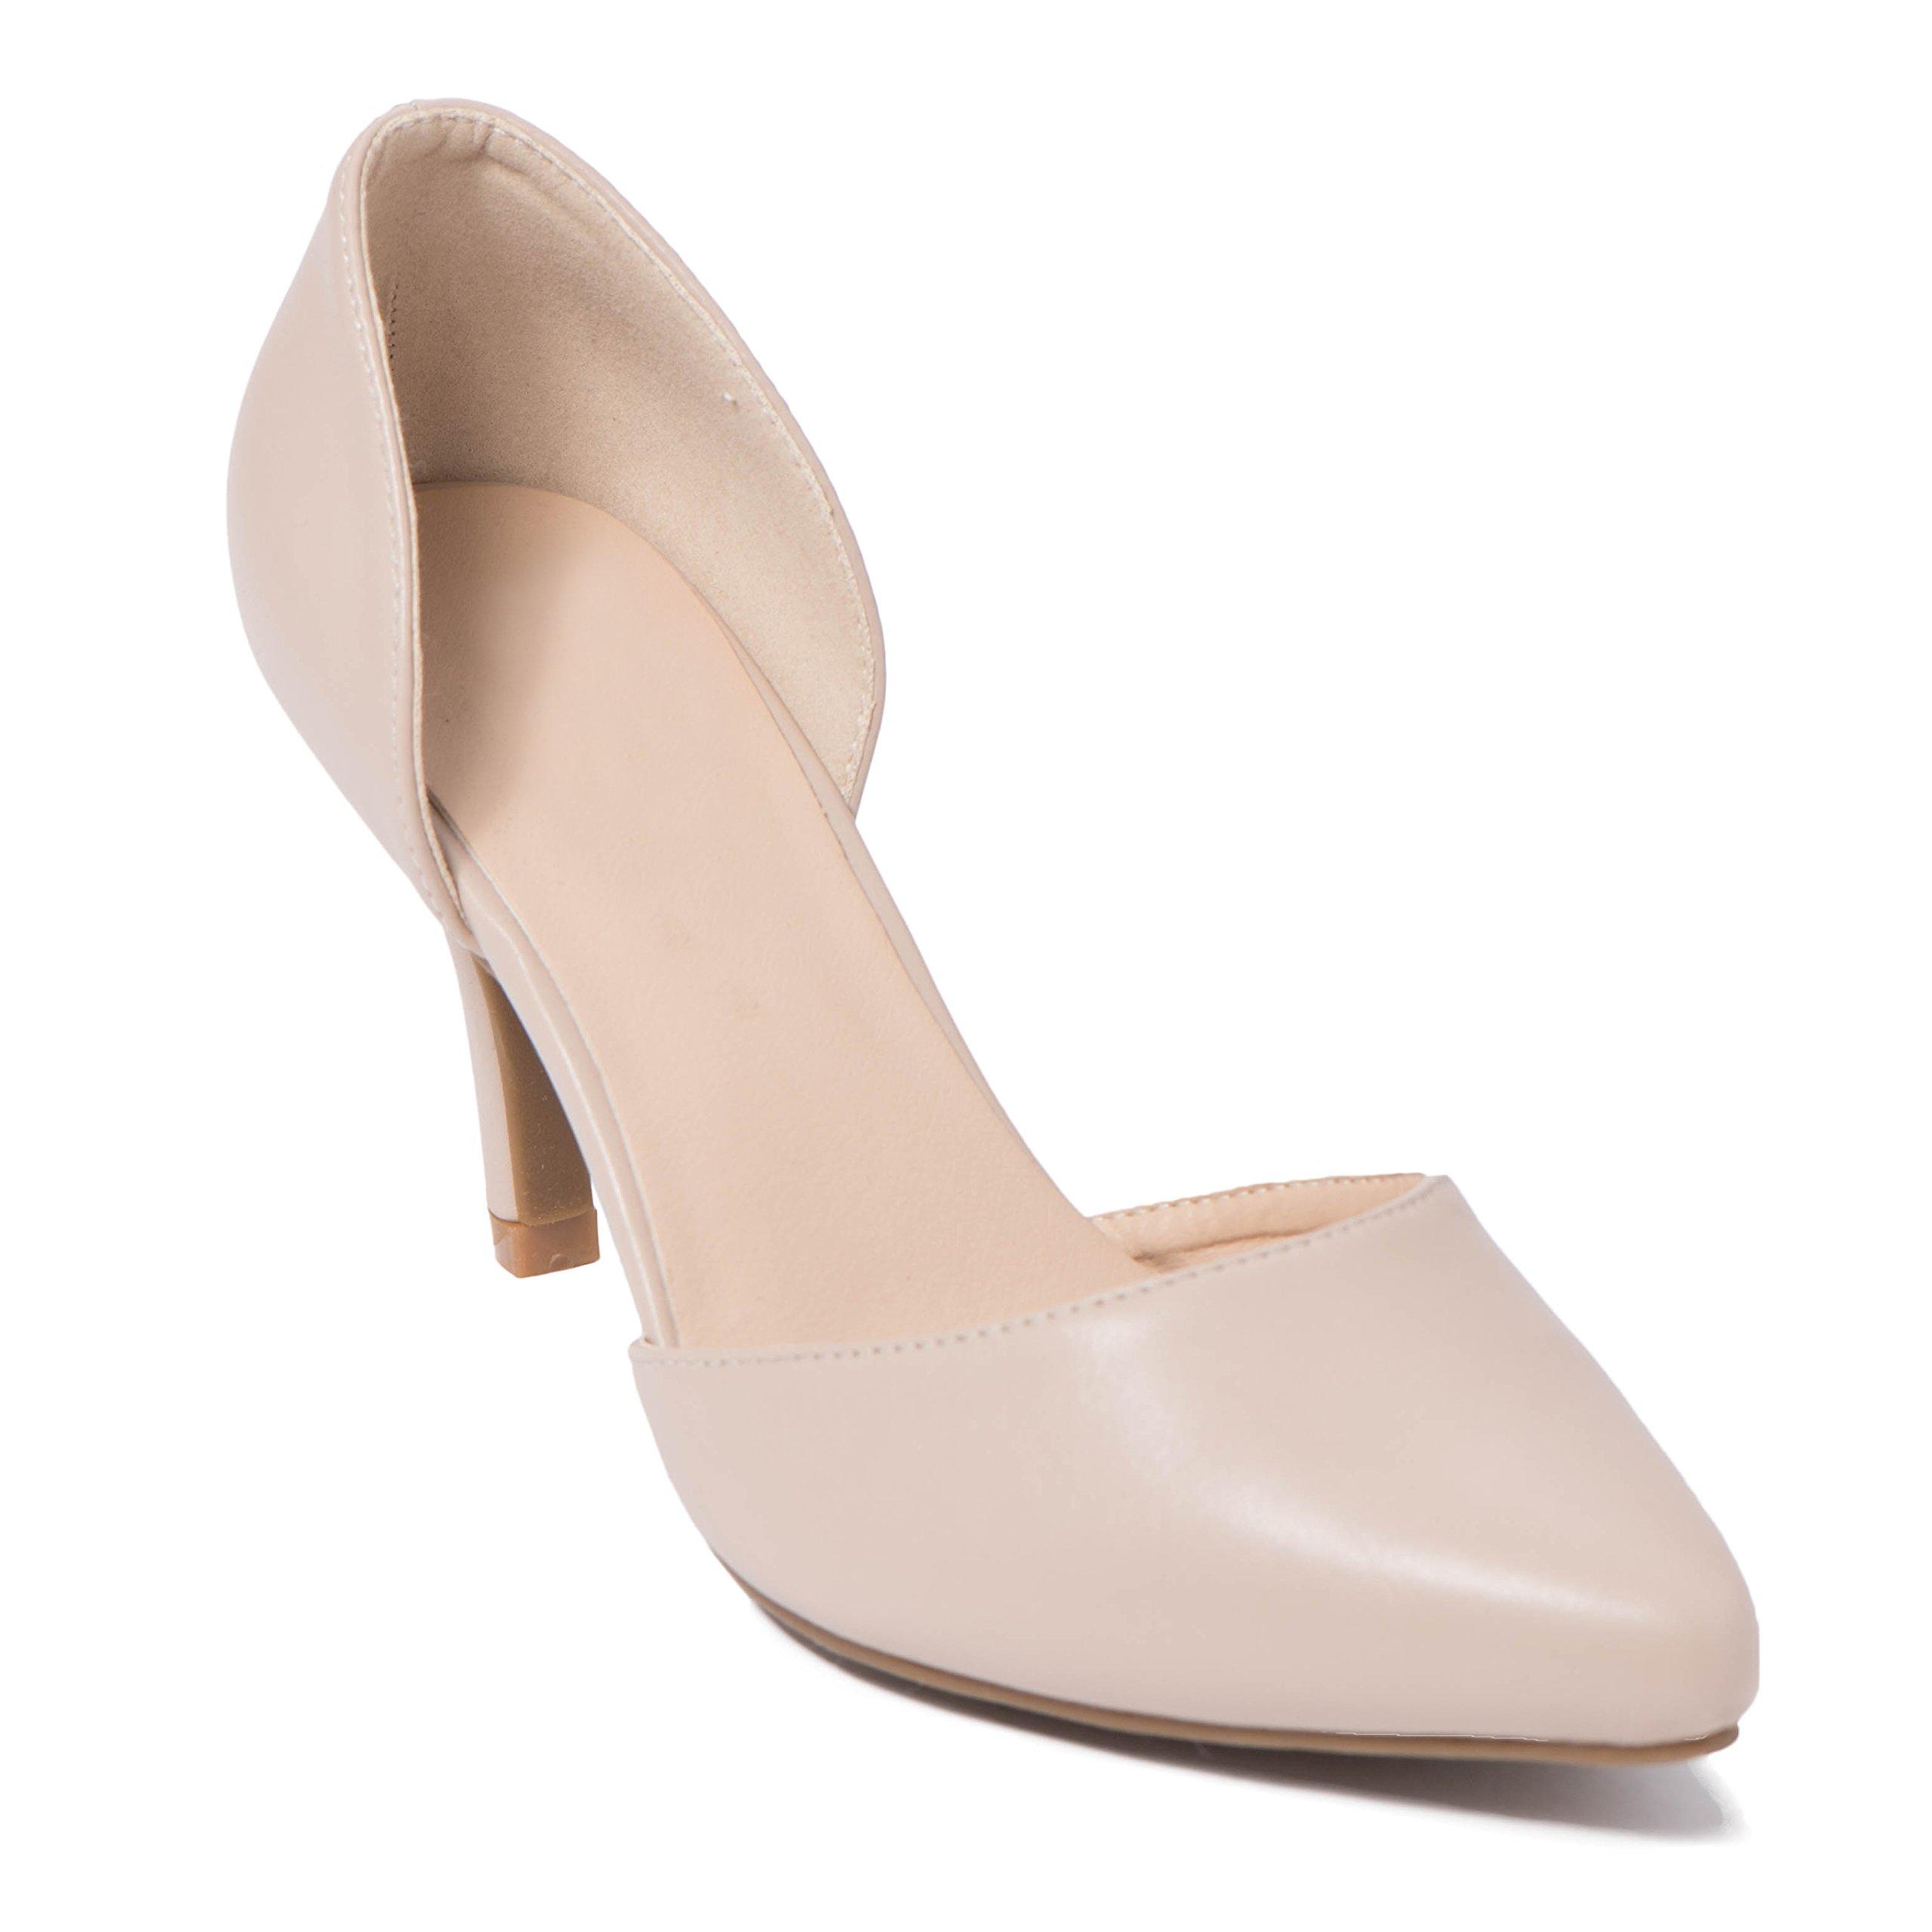 ShoBeautiful Women's D'Orsay Pump Slip on Low Stiletto Heel Party Dress Shoes Summer Sandals TK09 Natural 7.5